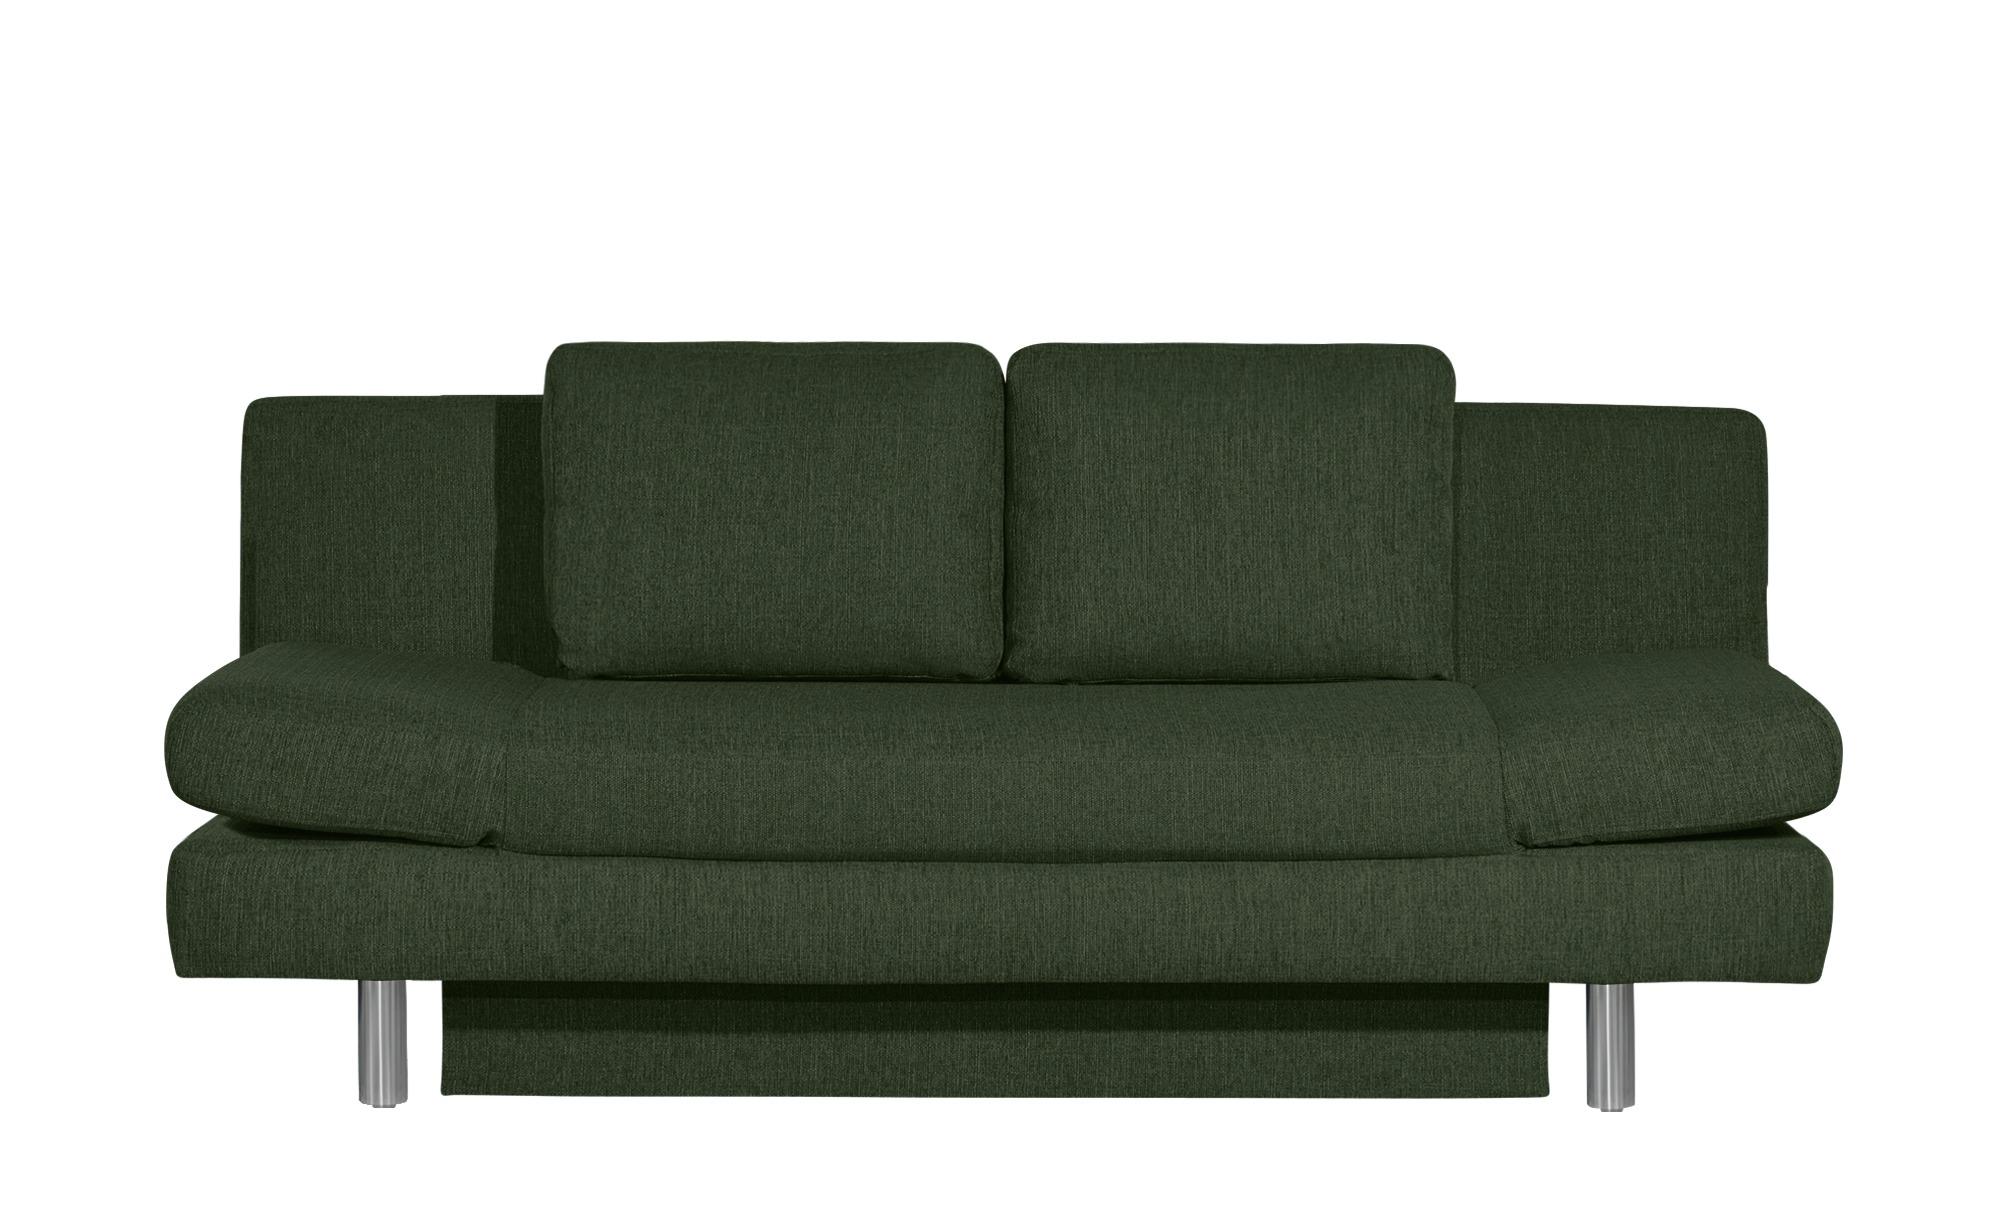 smart Schlafsofa grün - Webstoff Nina ¦ grün ¦ Maße (cm): B: 205 H: 90 T: 95 Polstermöbel > Sofas > 2-Sitzer - Höffner